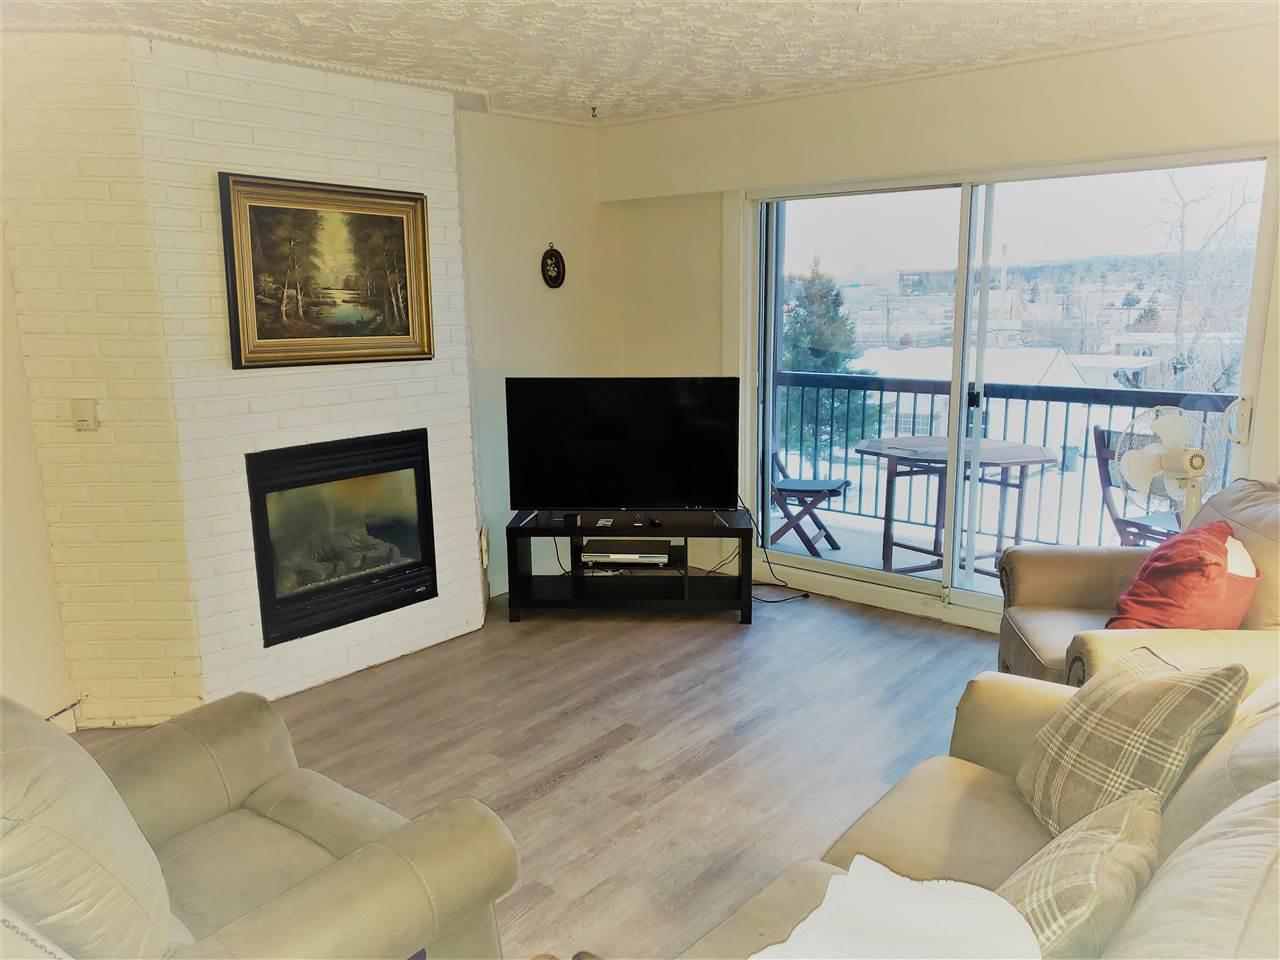 Main Photo: 203 1654 10TH Avenue in Prince George: Crescents Condo for sale (PG City Central (Zone 72))  : MLS®# R2520399